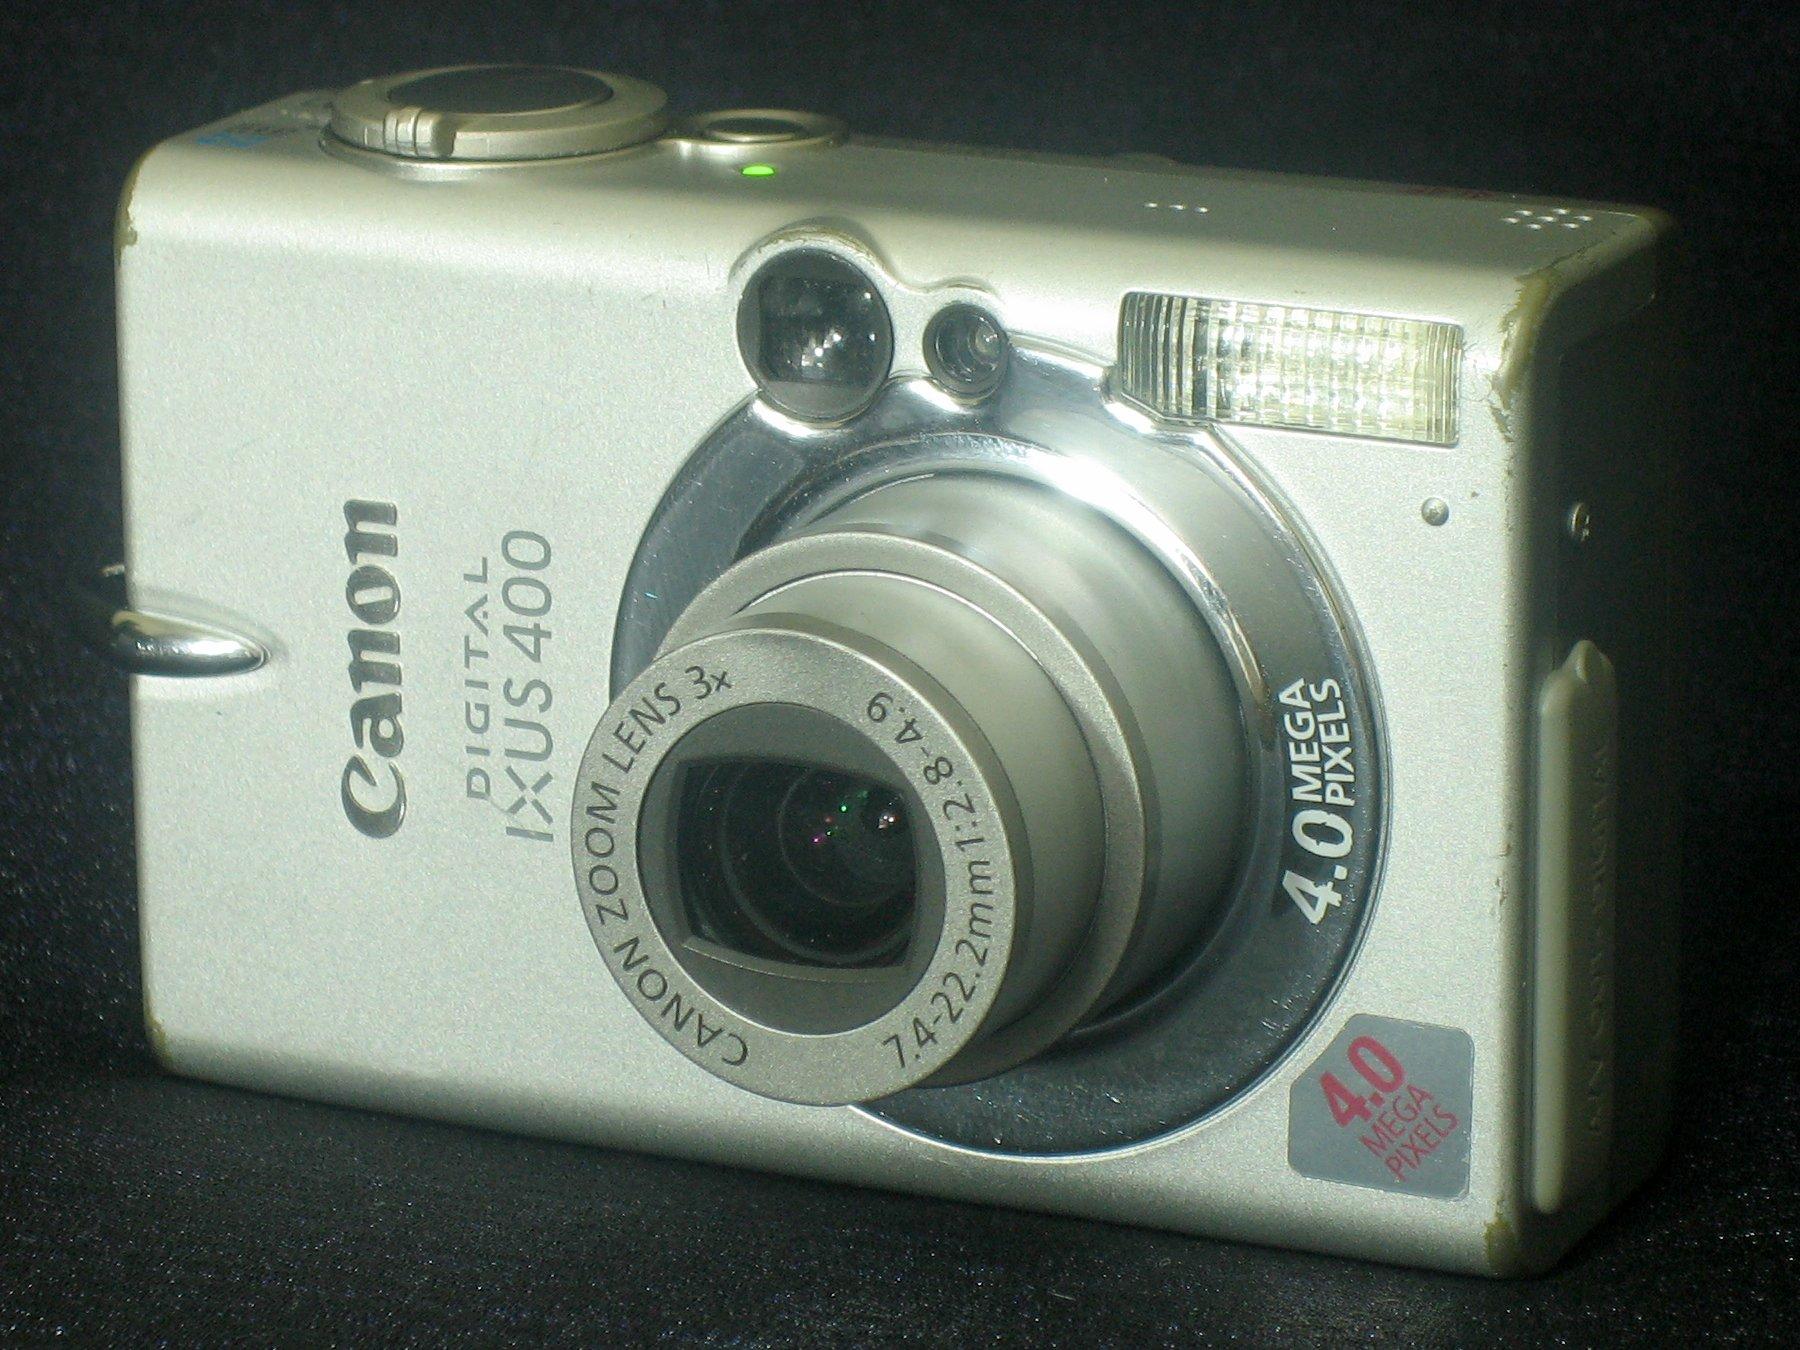 File:Canon Digital IXUS 400 front.jpg